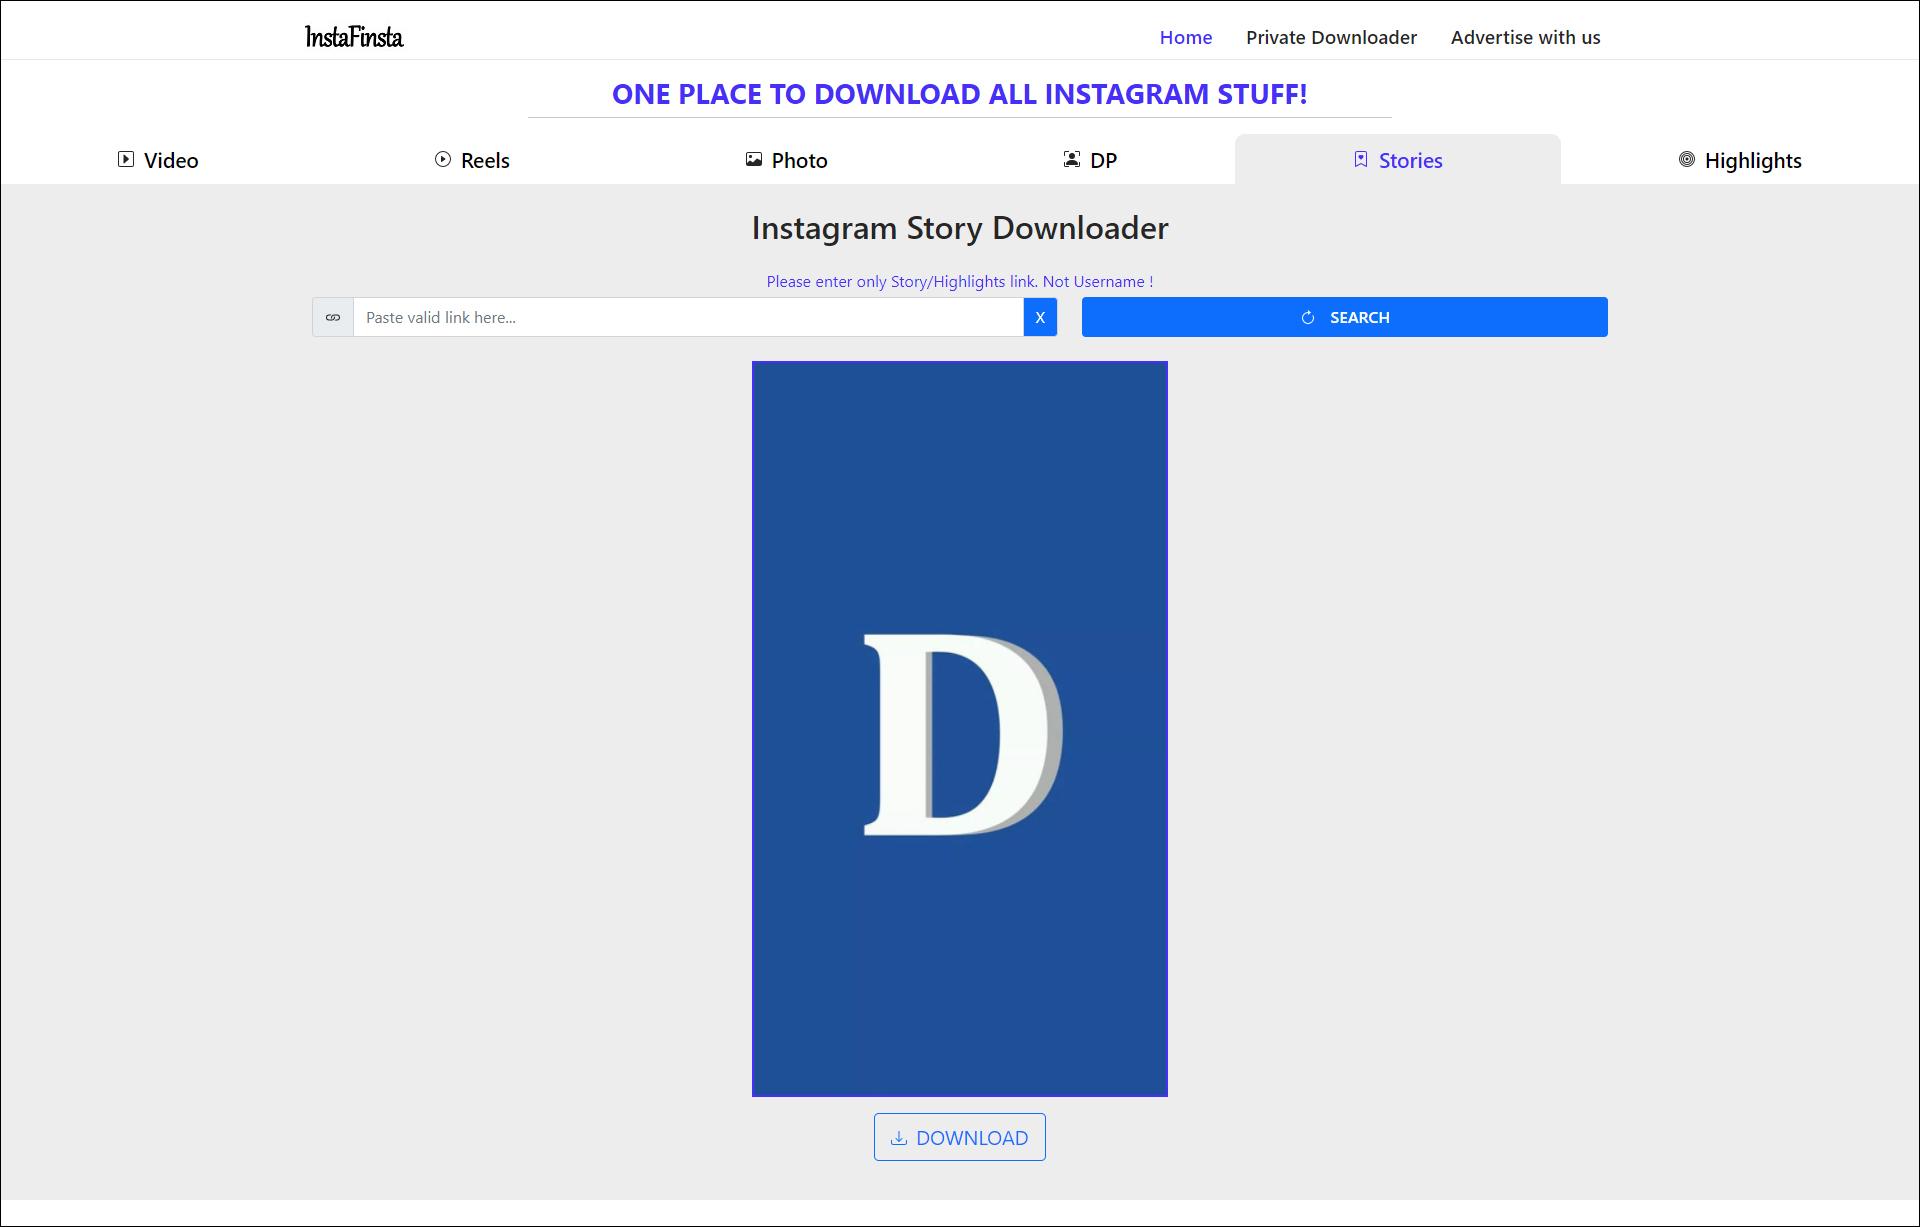 3 Download story dari Insta Finsta